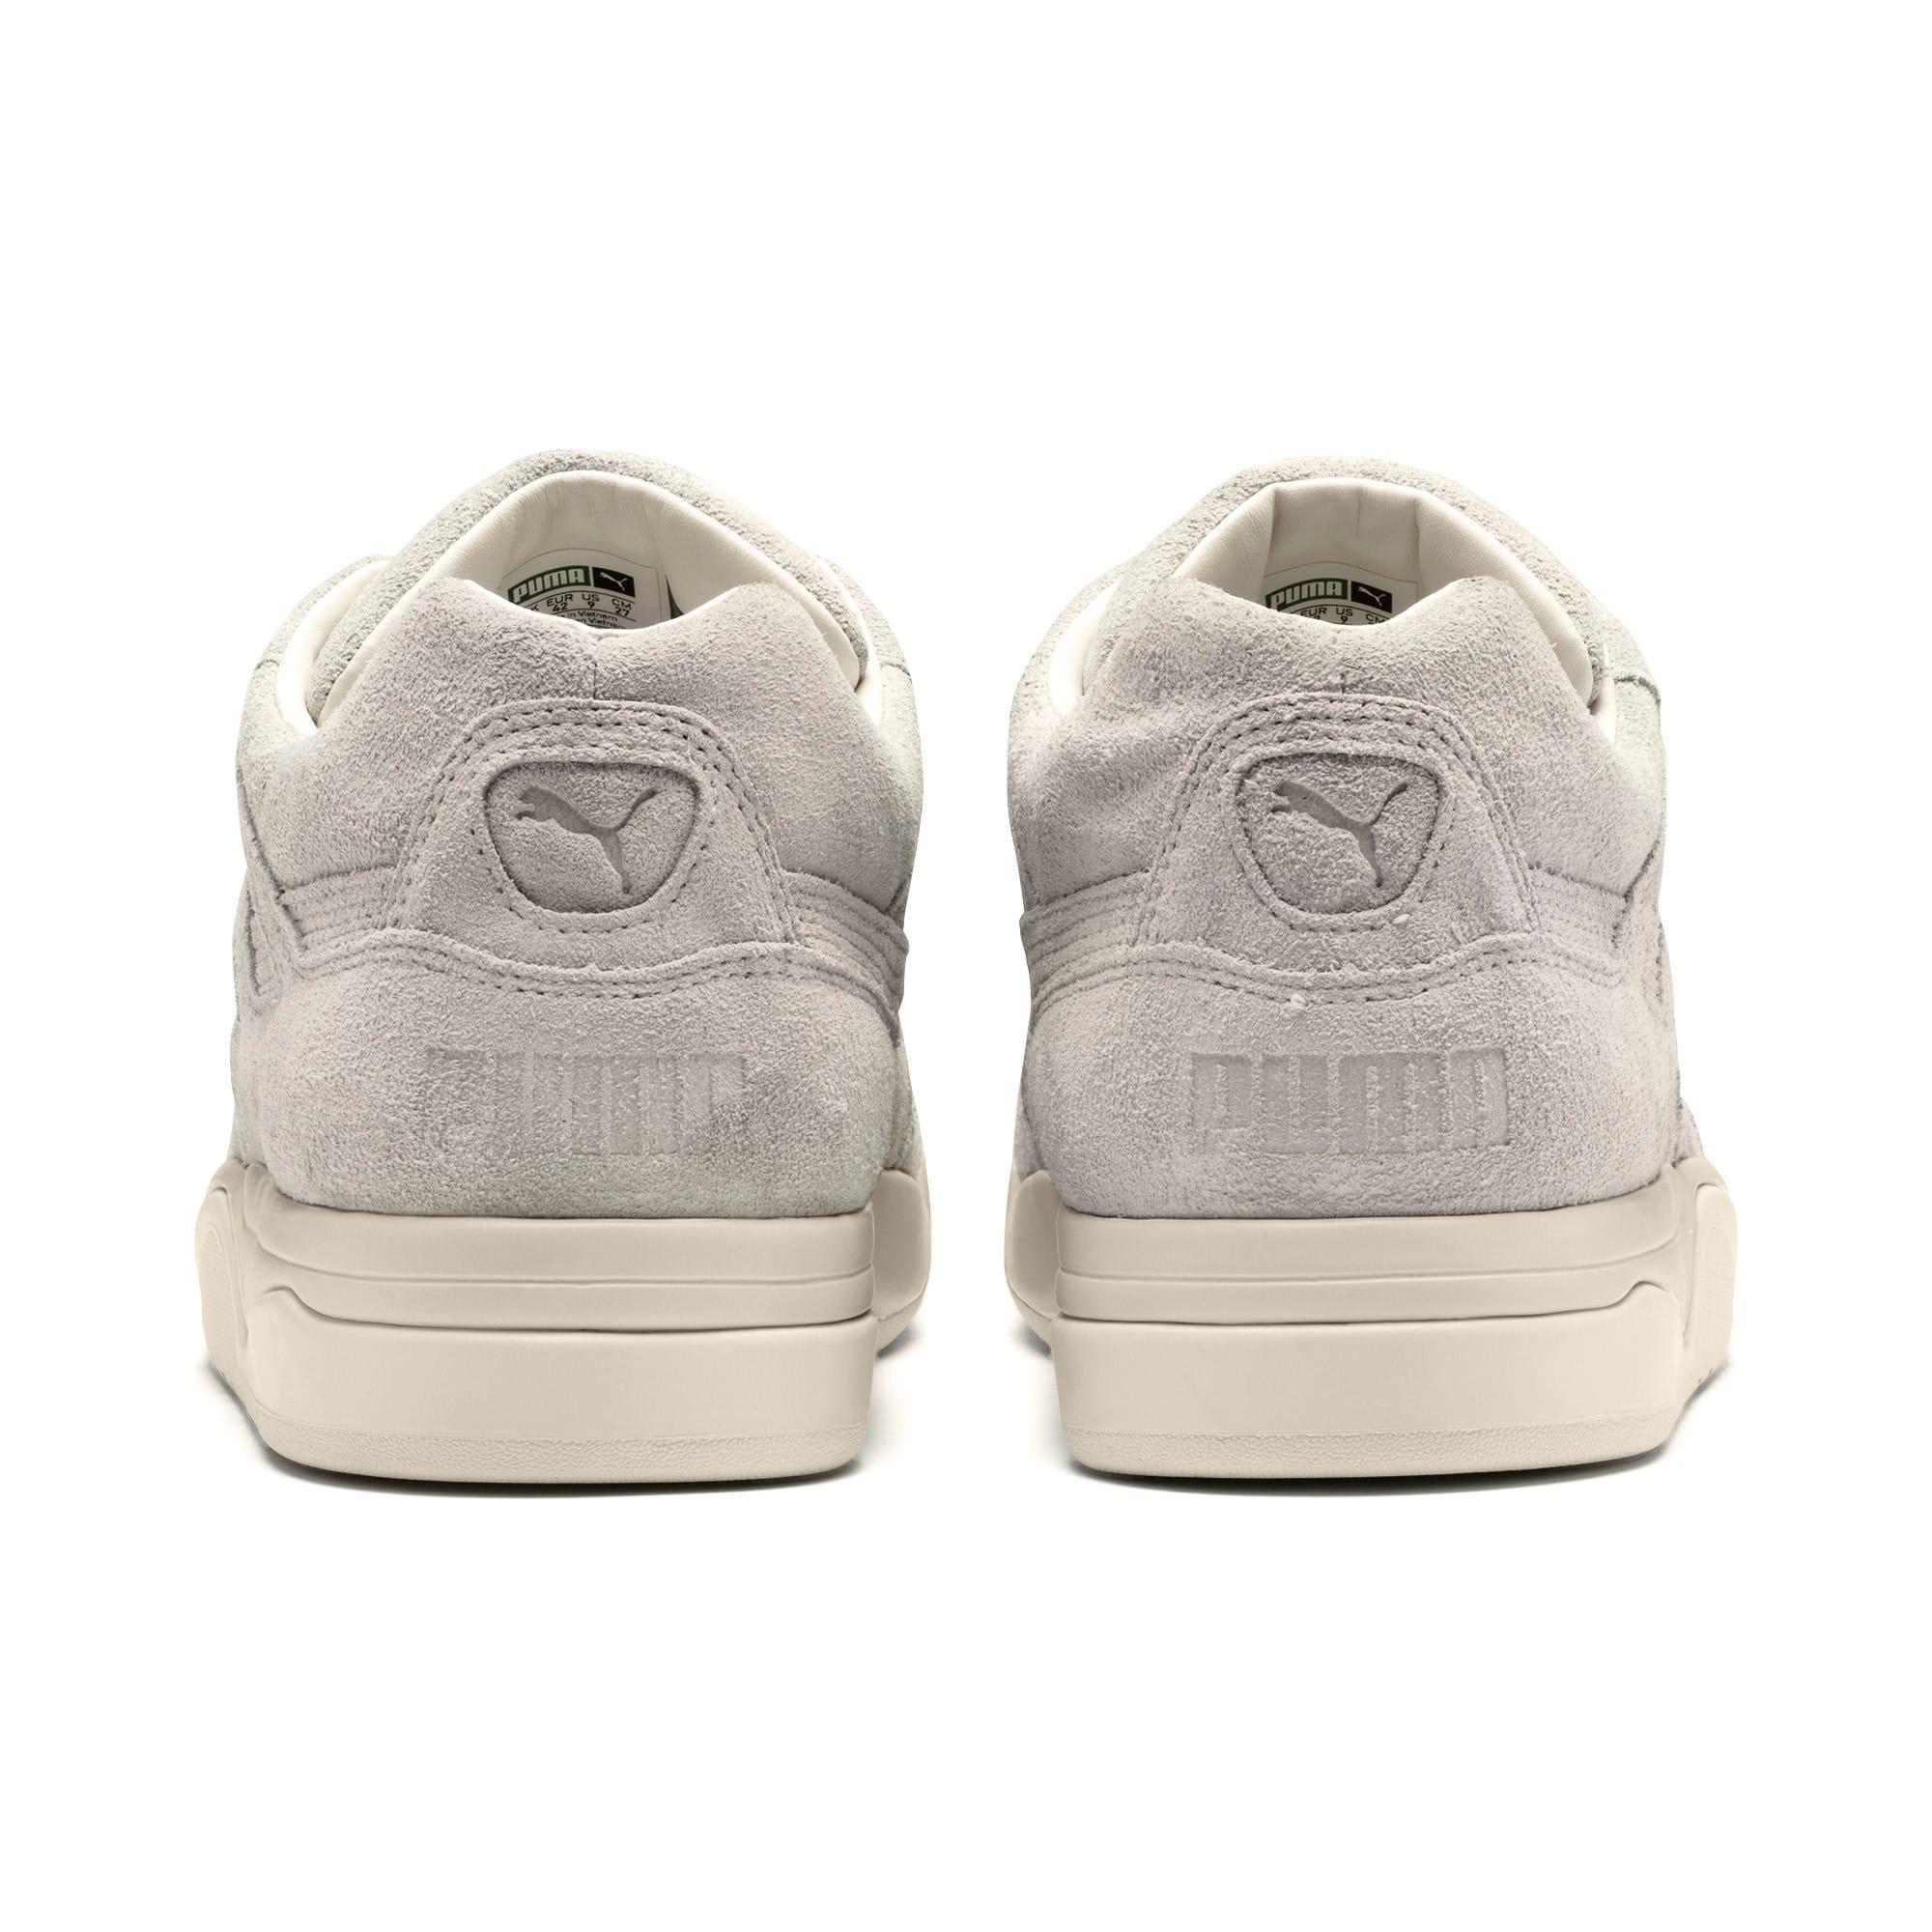 Thumbnail 3 of Palace Guard 4th of July Sneakers, Whisper White-Puma Black, medium